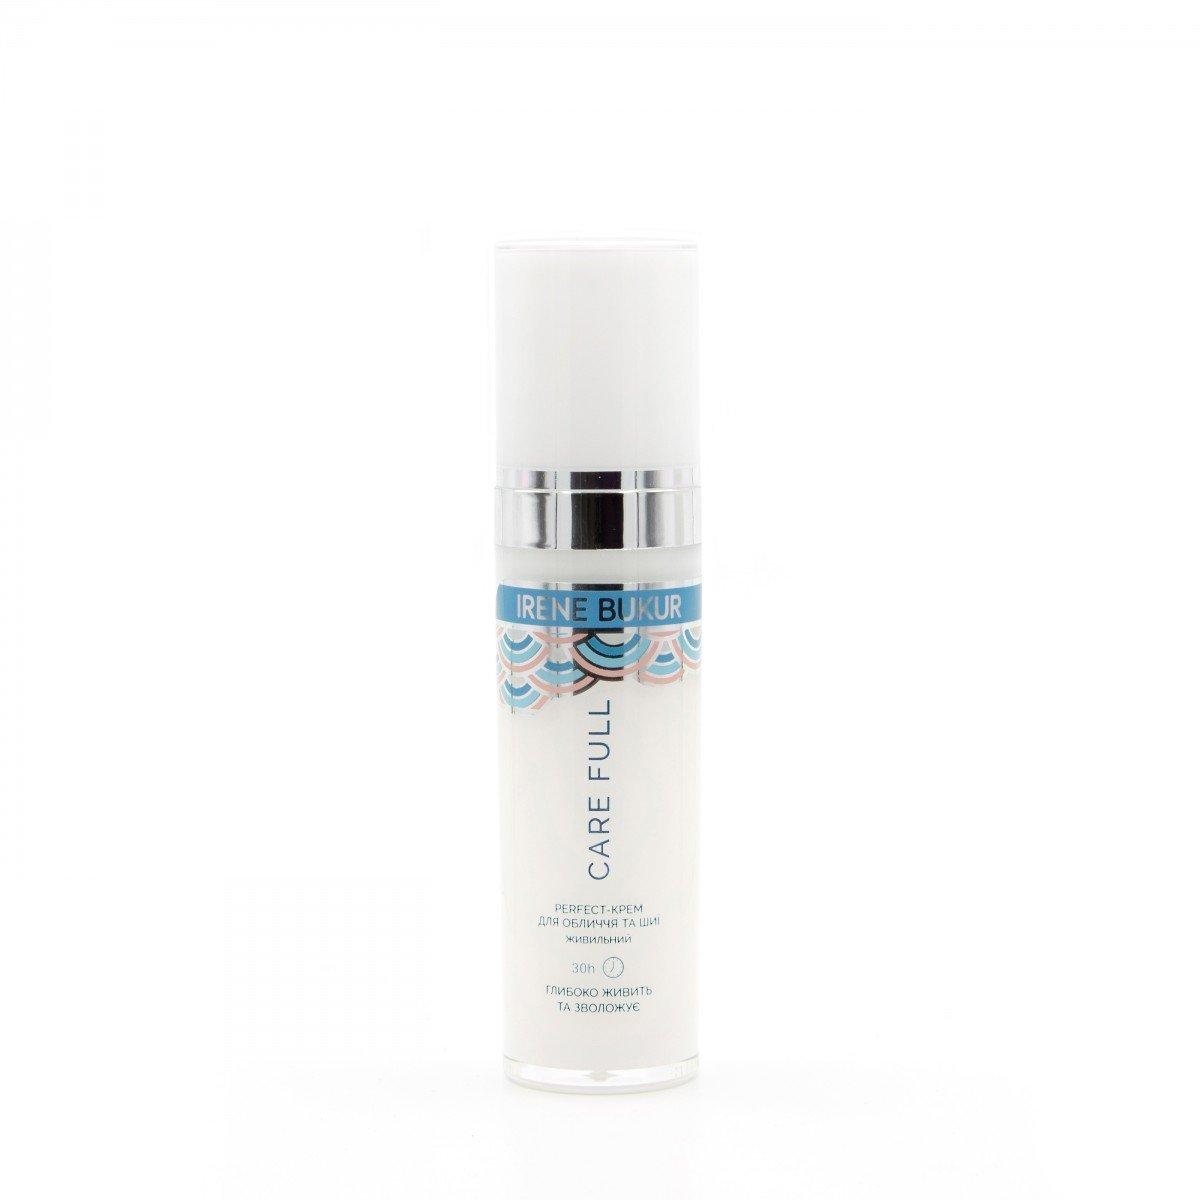 Perfect-крем для обличчя Care Full, 50 мл  (SALE)